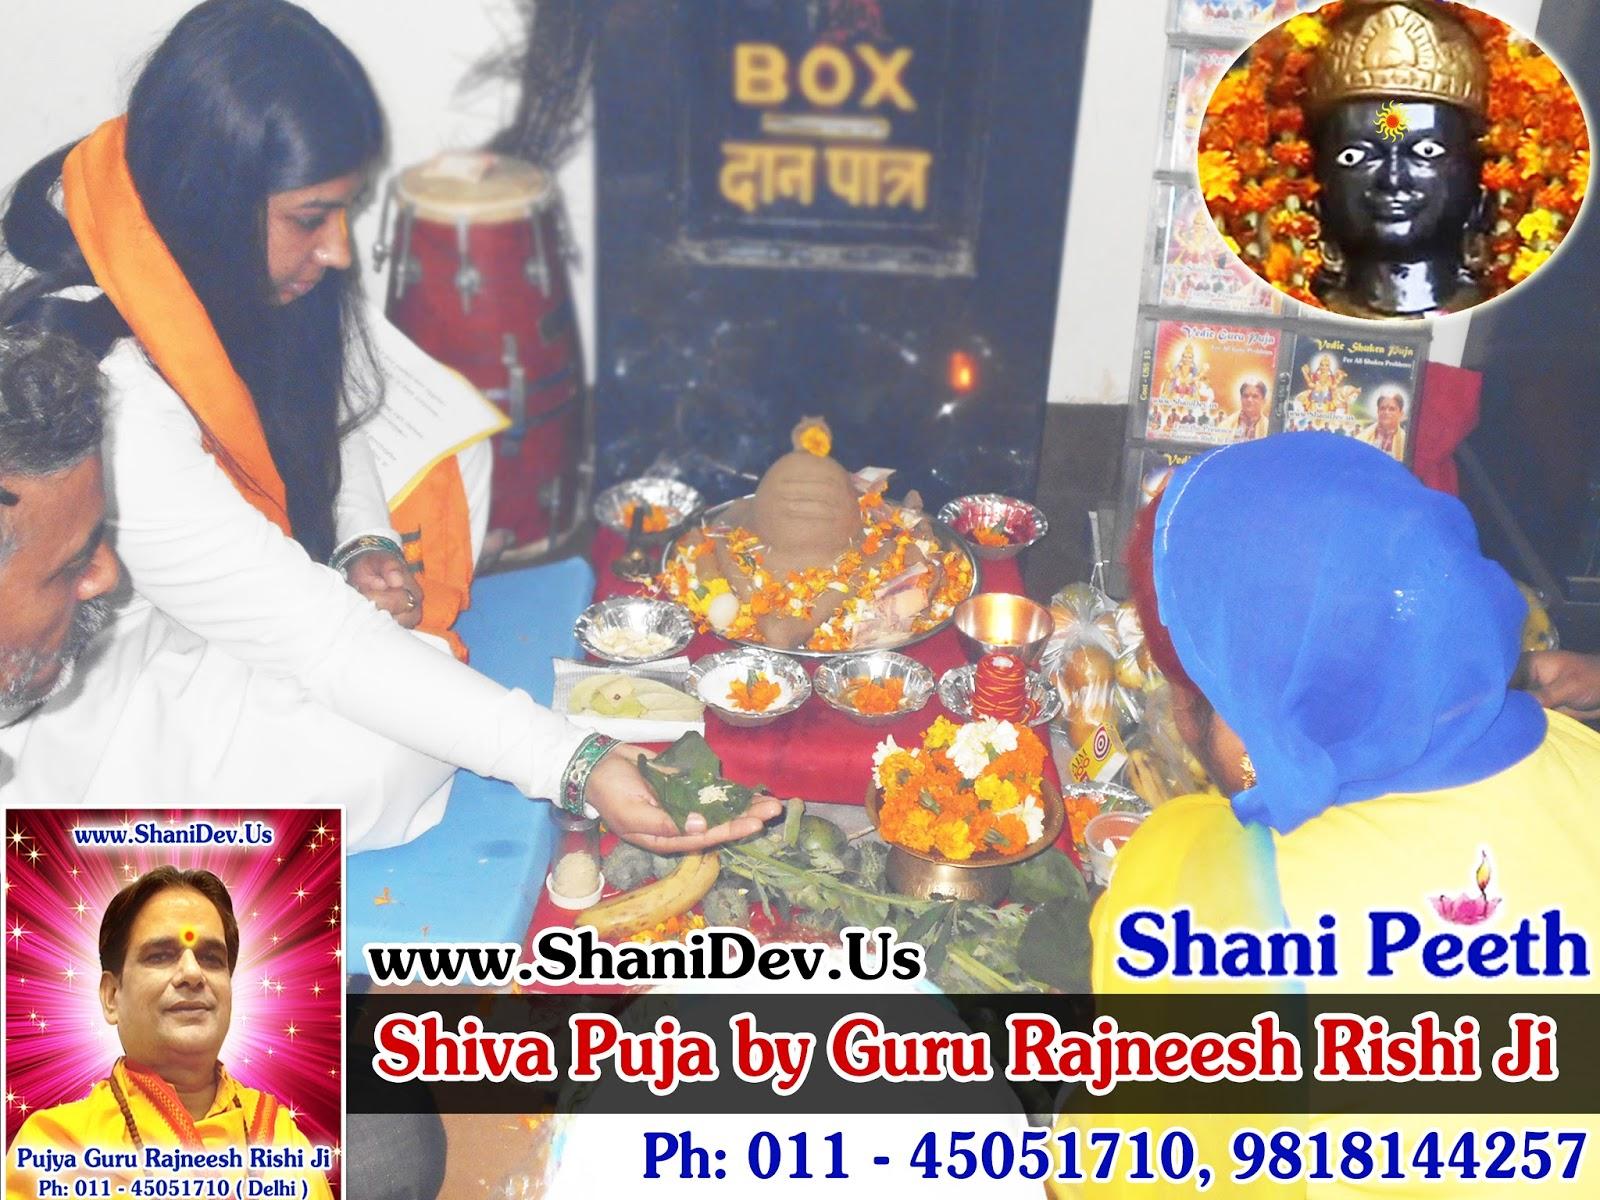 Shani Name 3d Wallpaper Shani Dev Shiva Puja On Shivratri With Guru Rajneesh